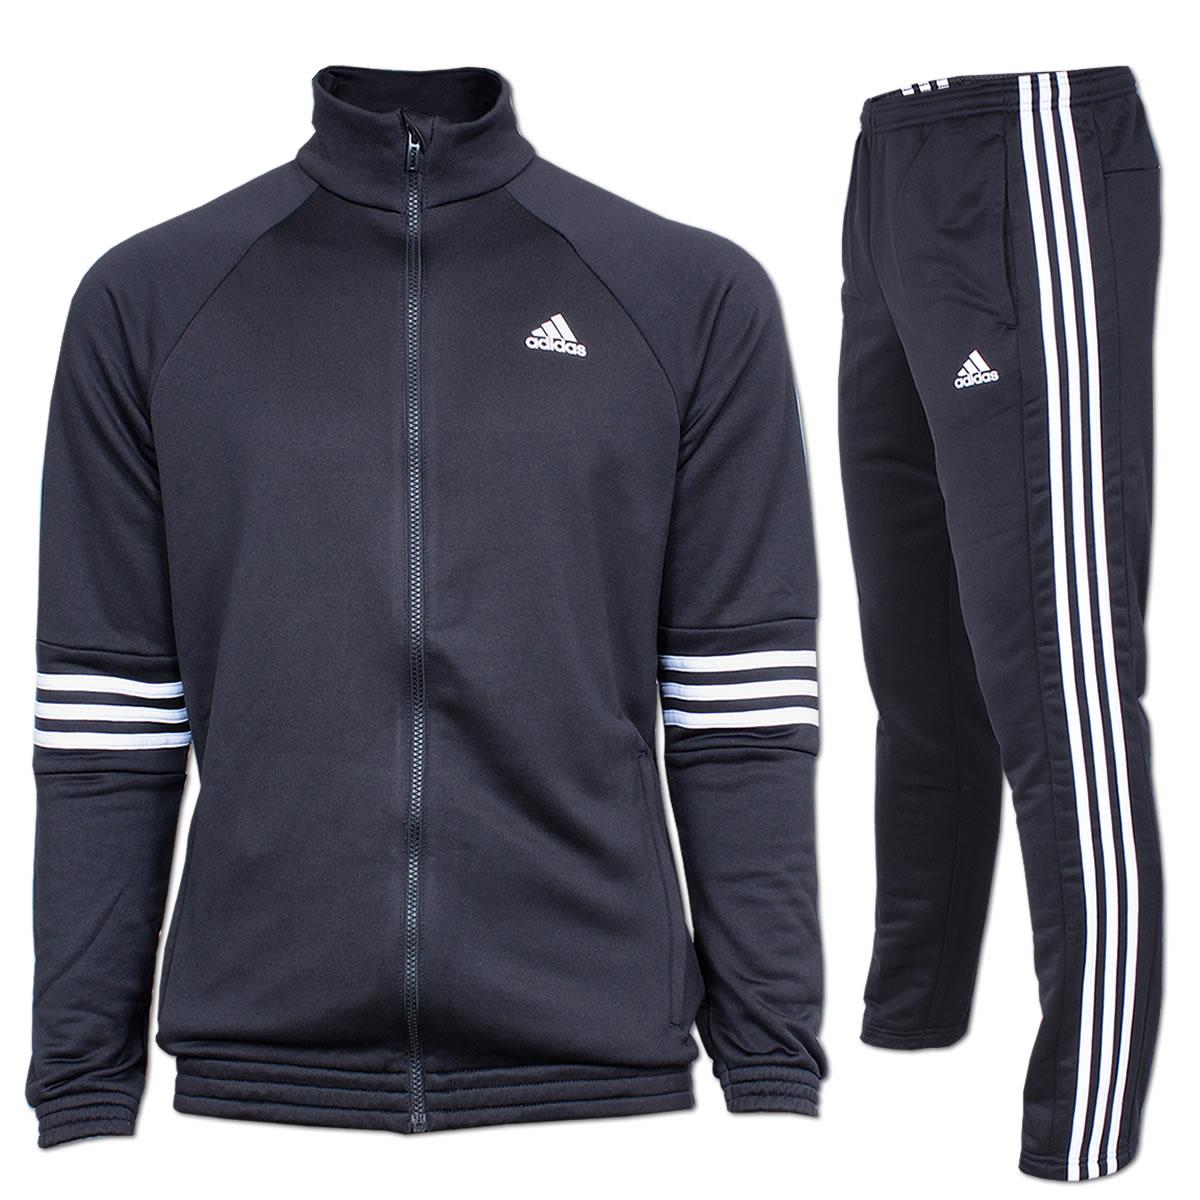 adidas trainingsanzug ts knit schwarz wei aj6297. Black Bedroom Furniture Sets. Home Design Ideas